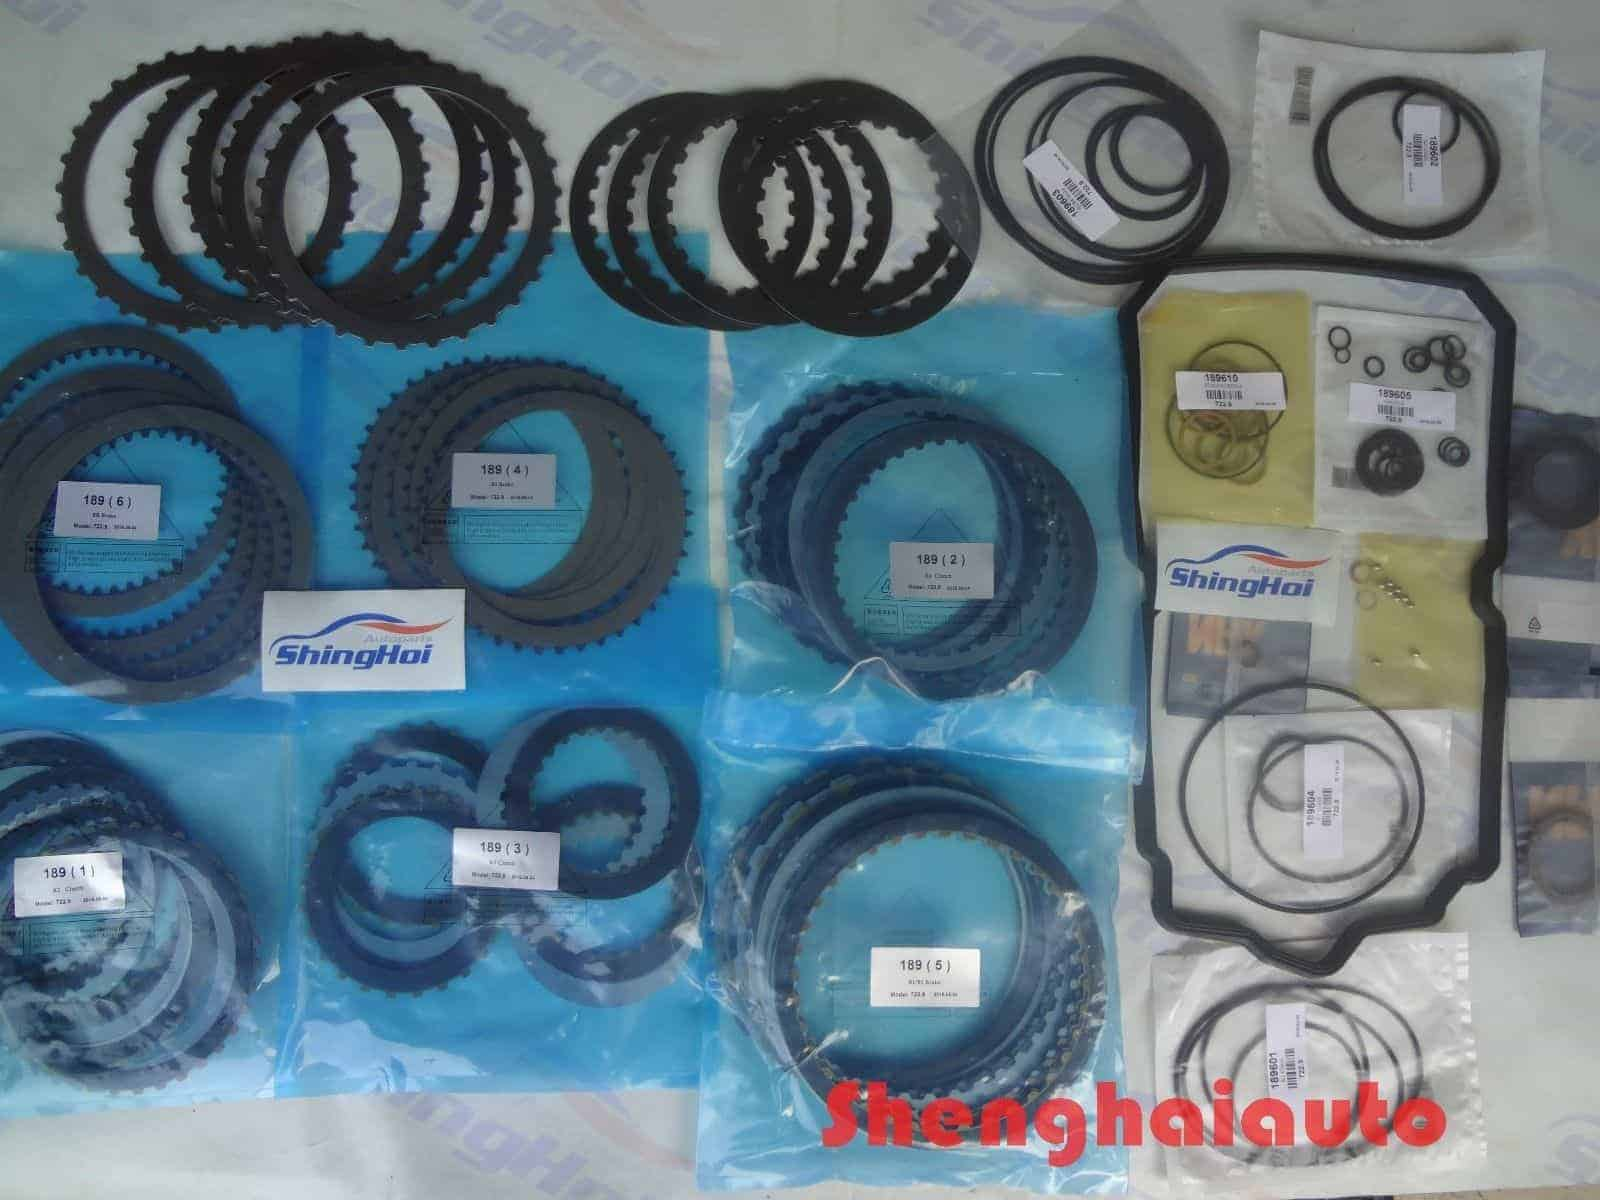 7g 722 9 automatic transmission master rebuild kit for for Mercedes benz transmission parts